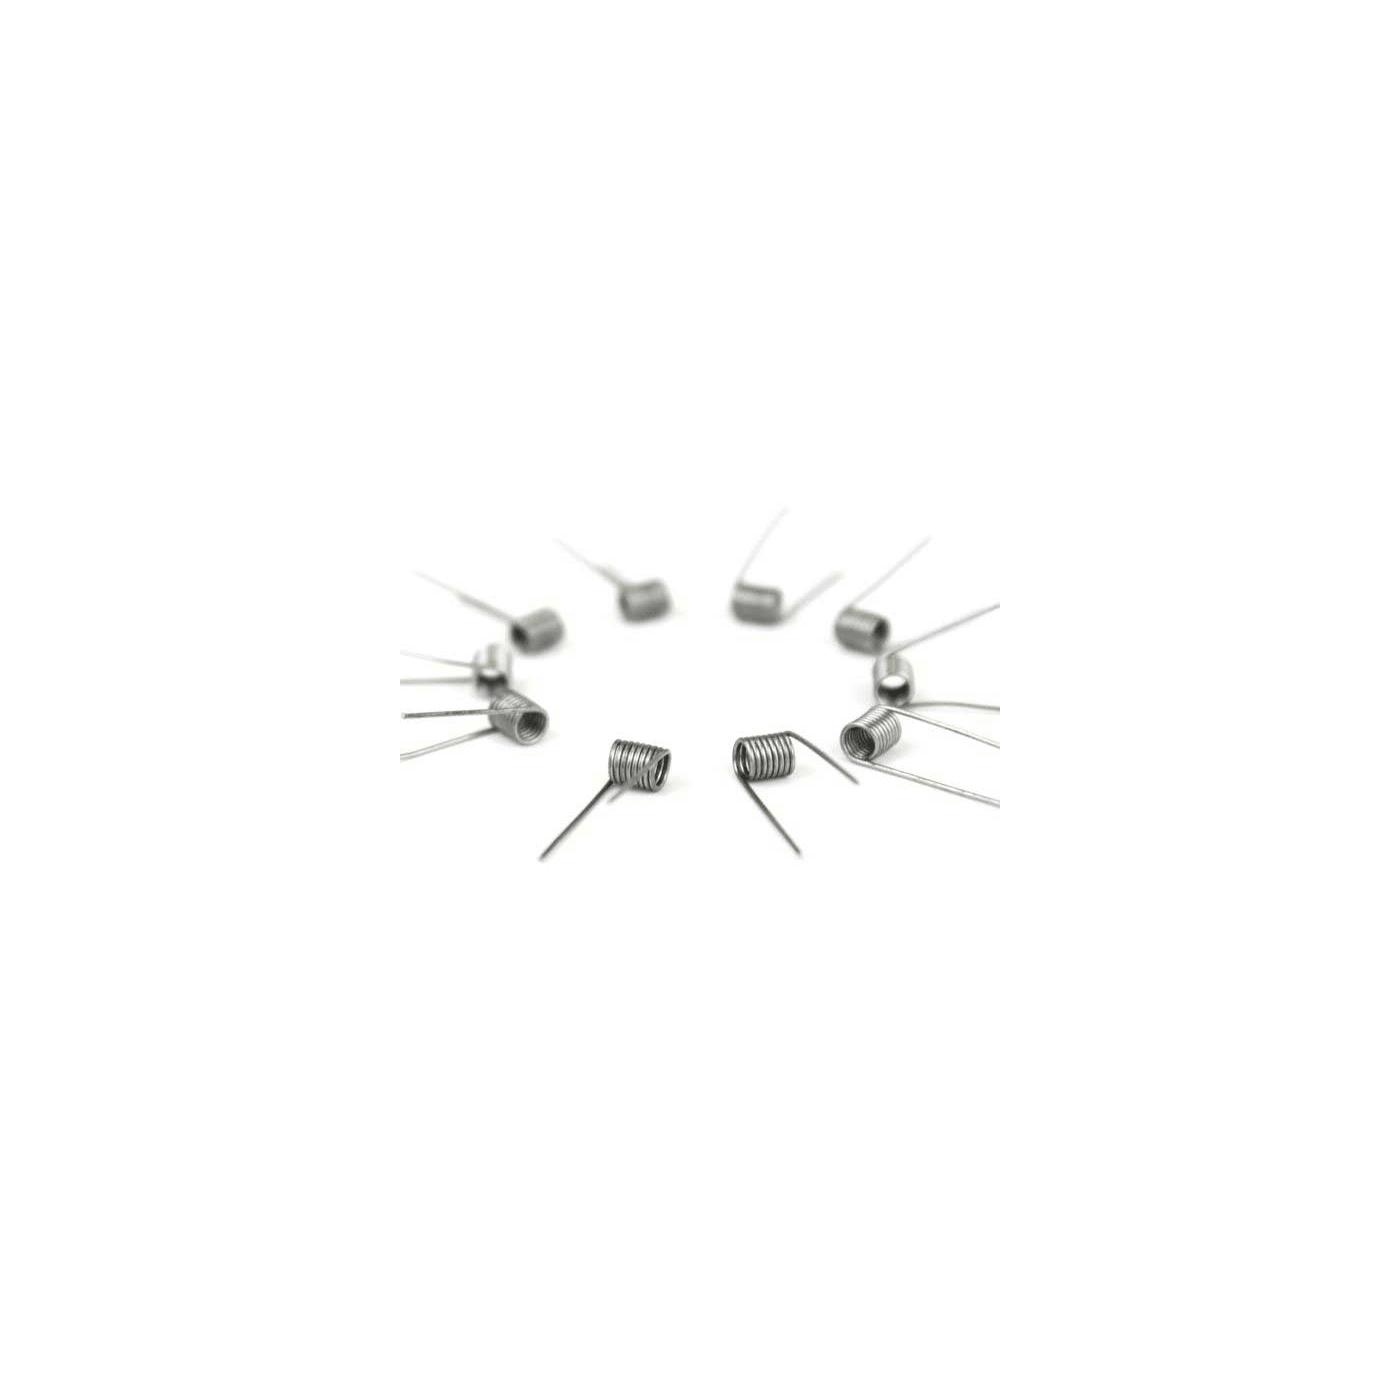 Prebuilt Sub Ohm Coils - 0.8 ohms - 10 pack